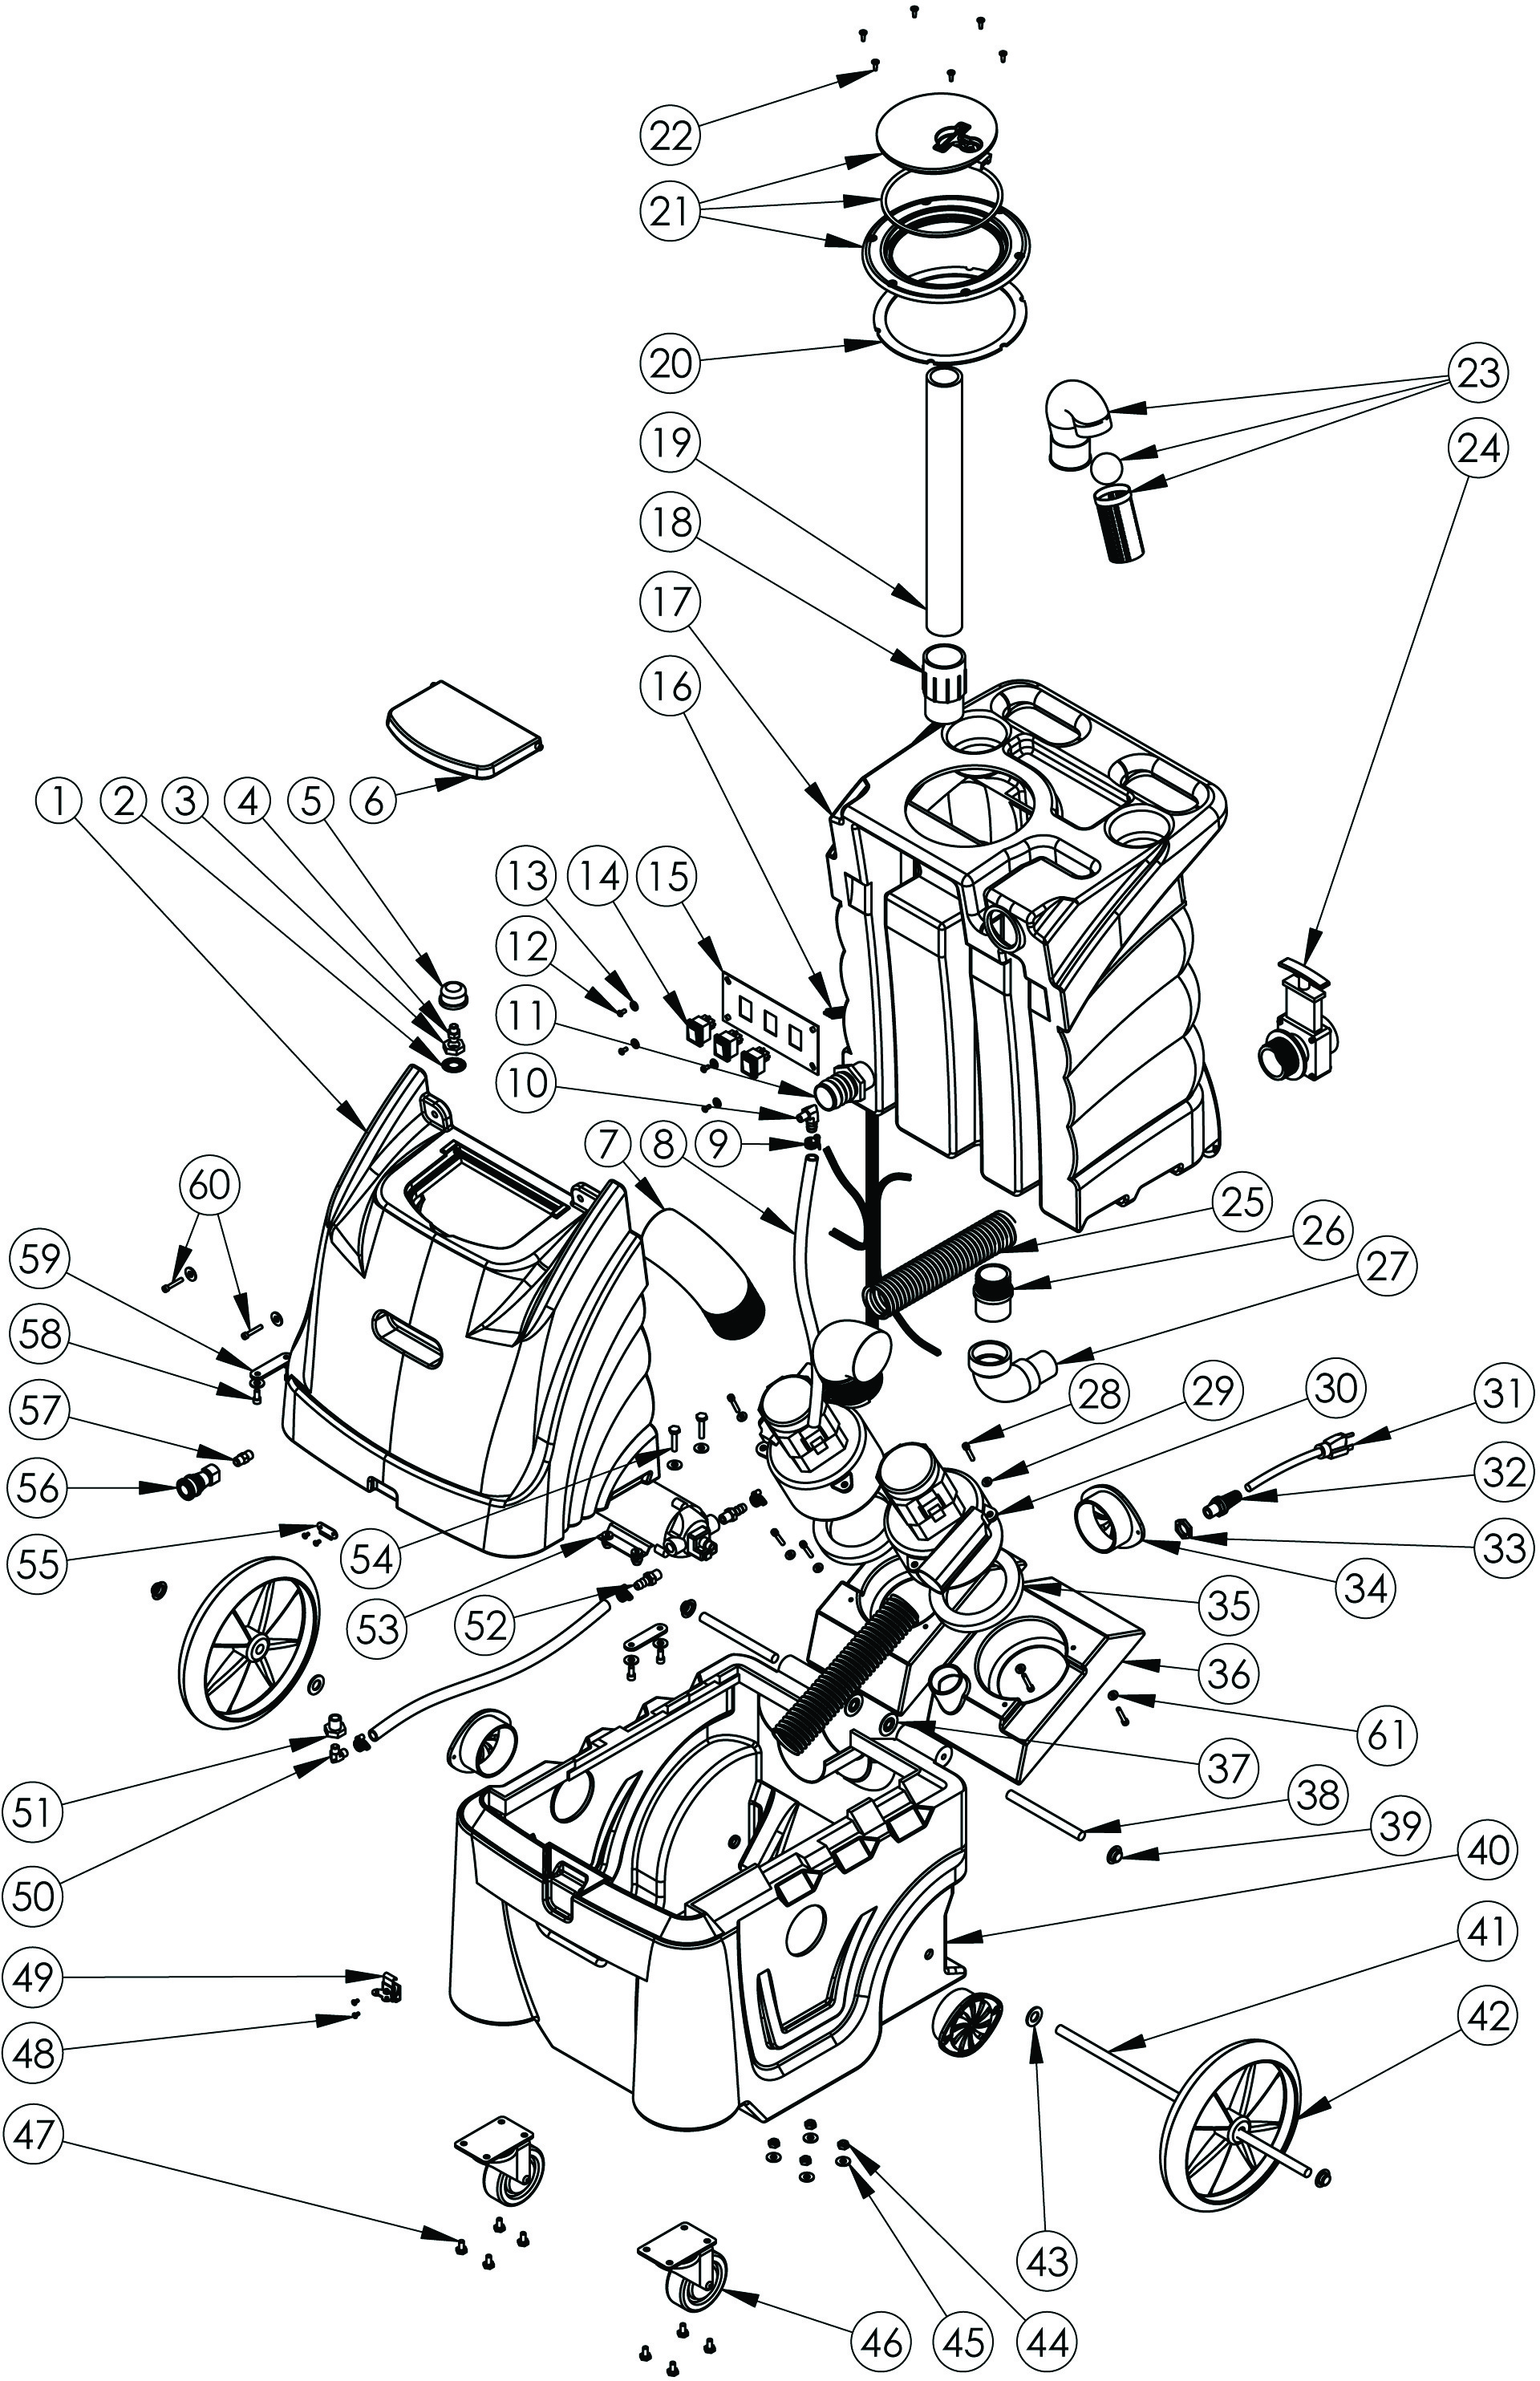 Sandia 80-2100 Carpet Extractor